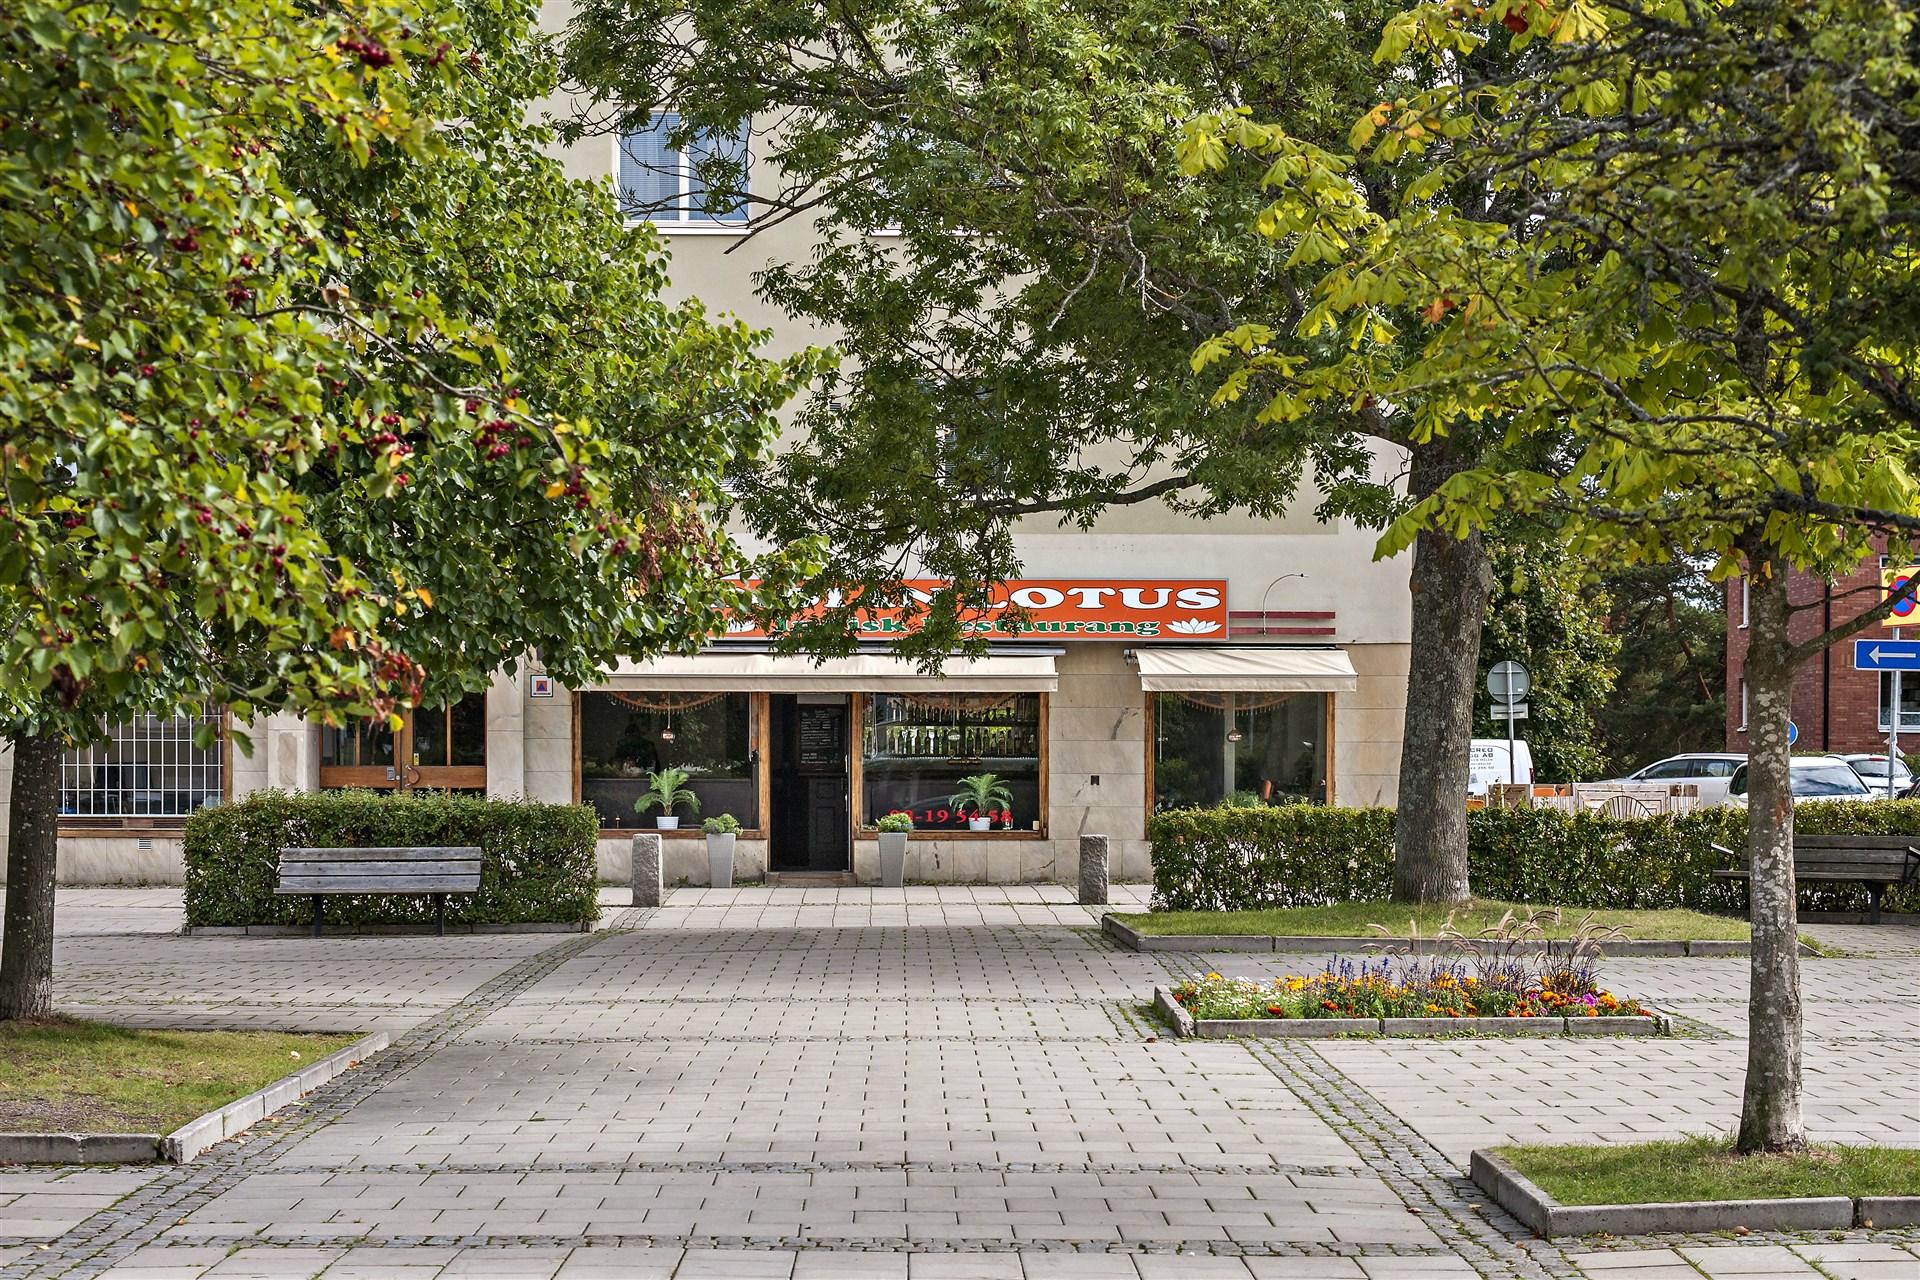 Torget i Hägerstensåsen med restaurangen Indian Lotus i bakgrunden